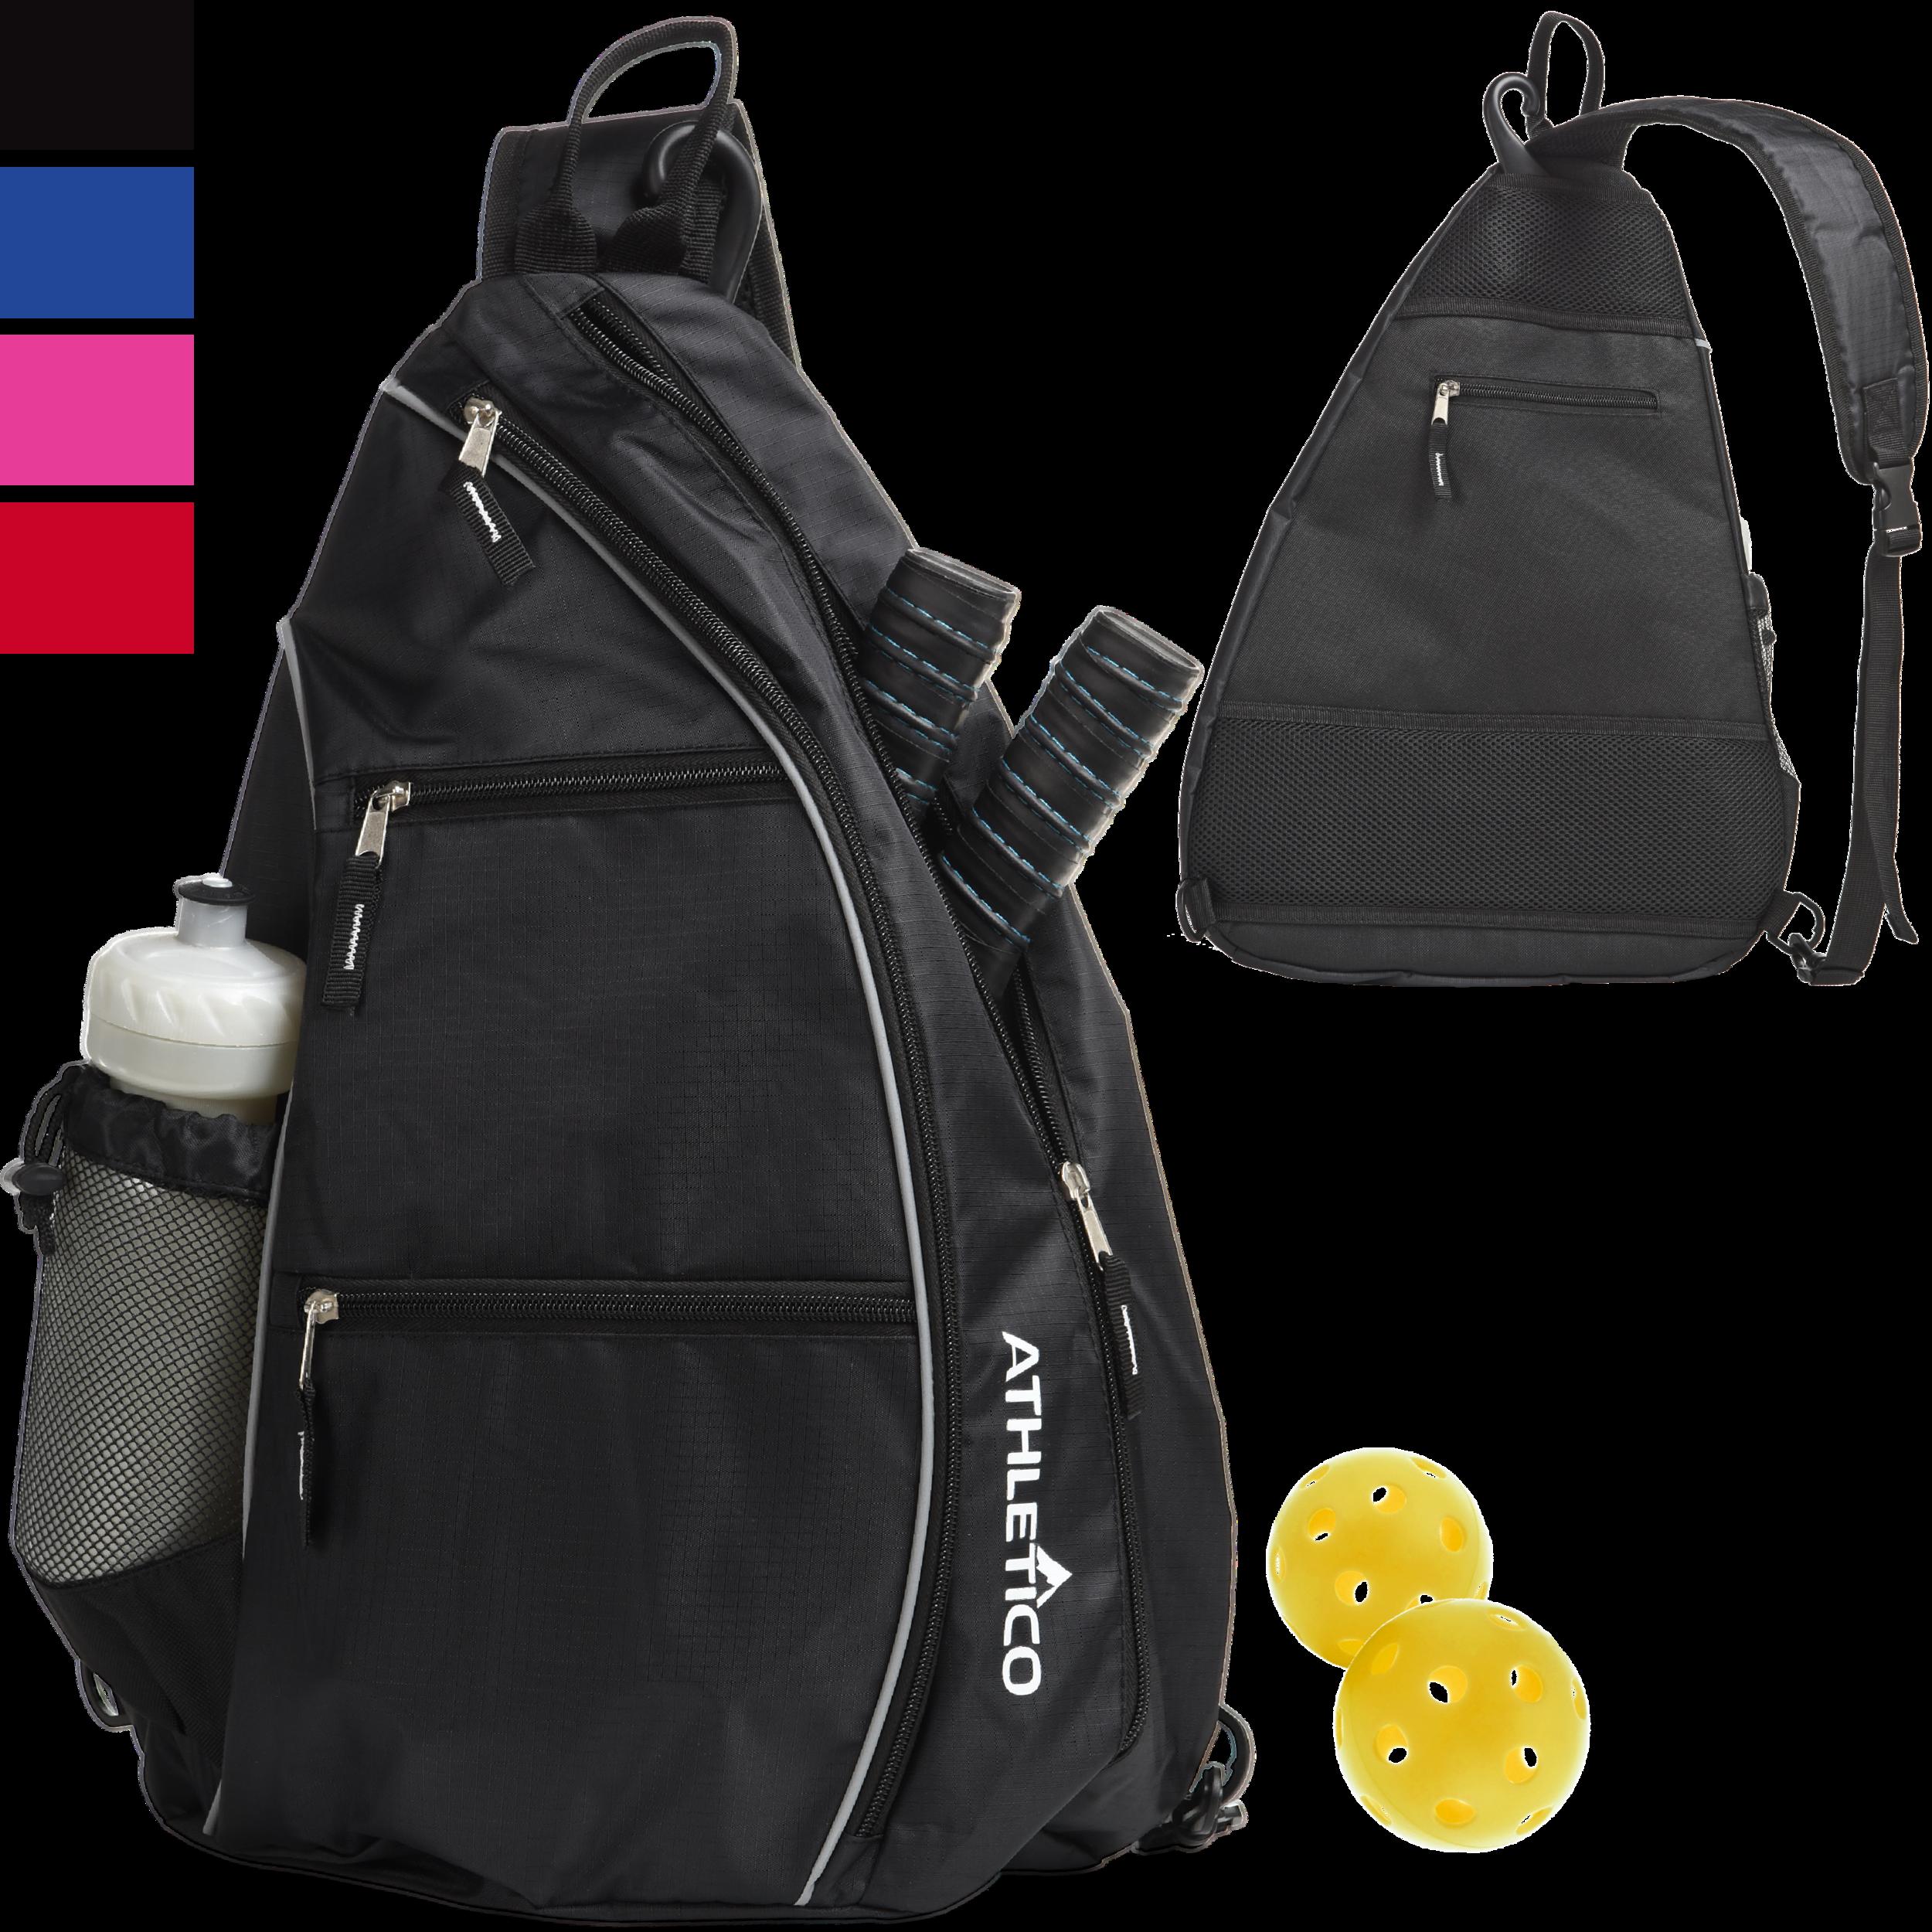 Everyday - Pickle Ball Sling Bag